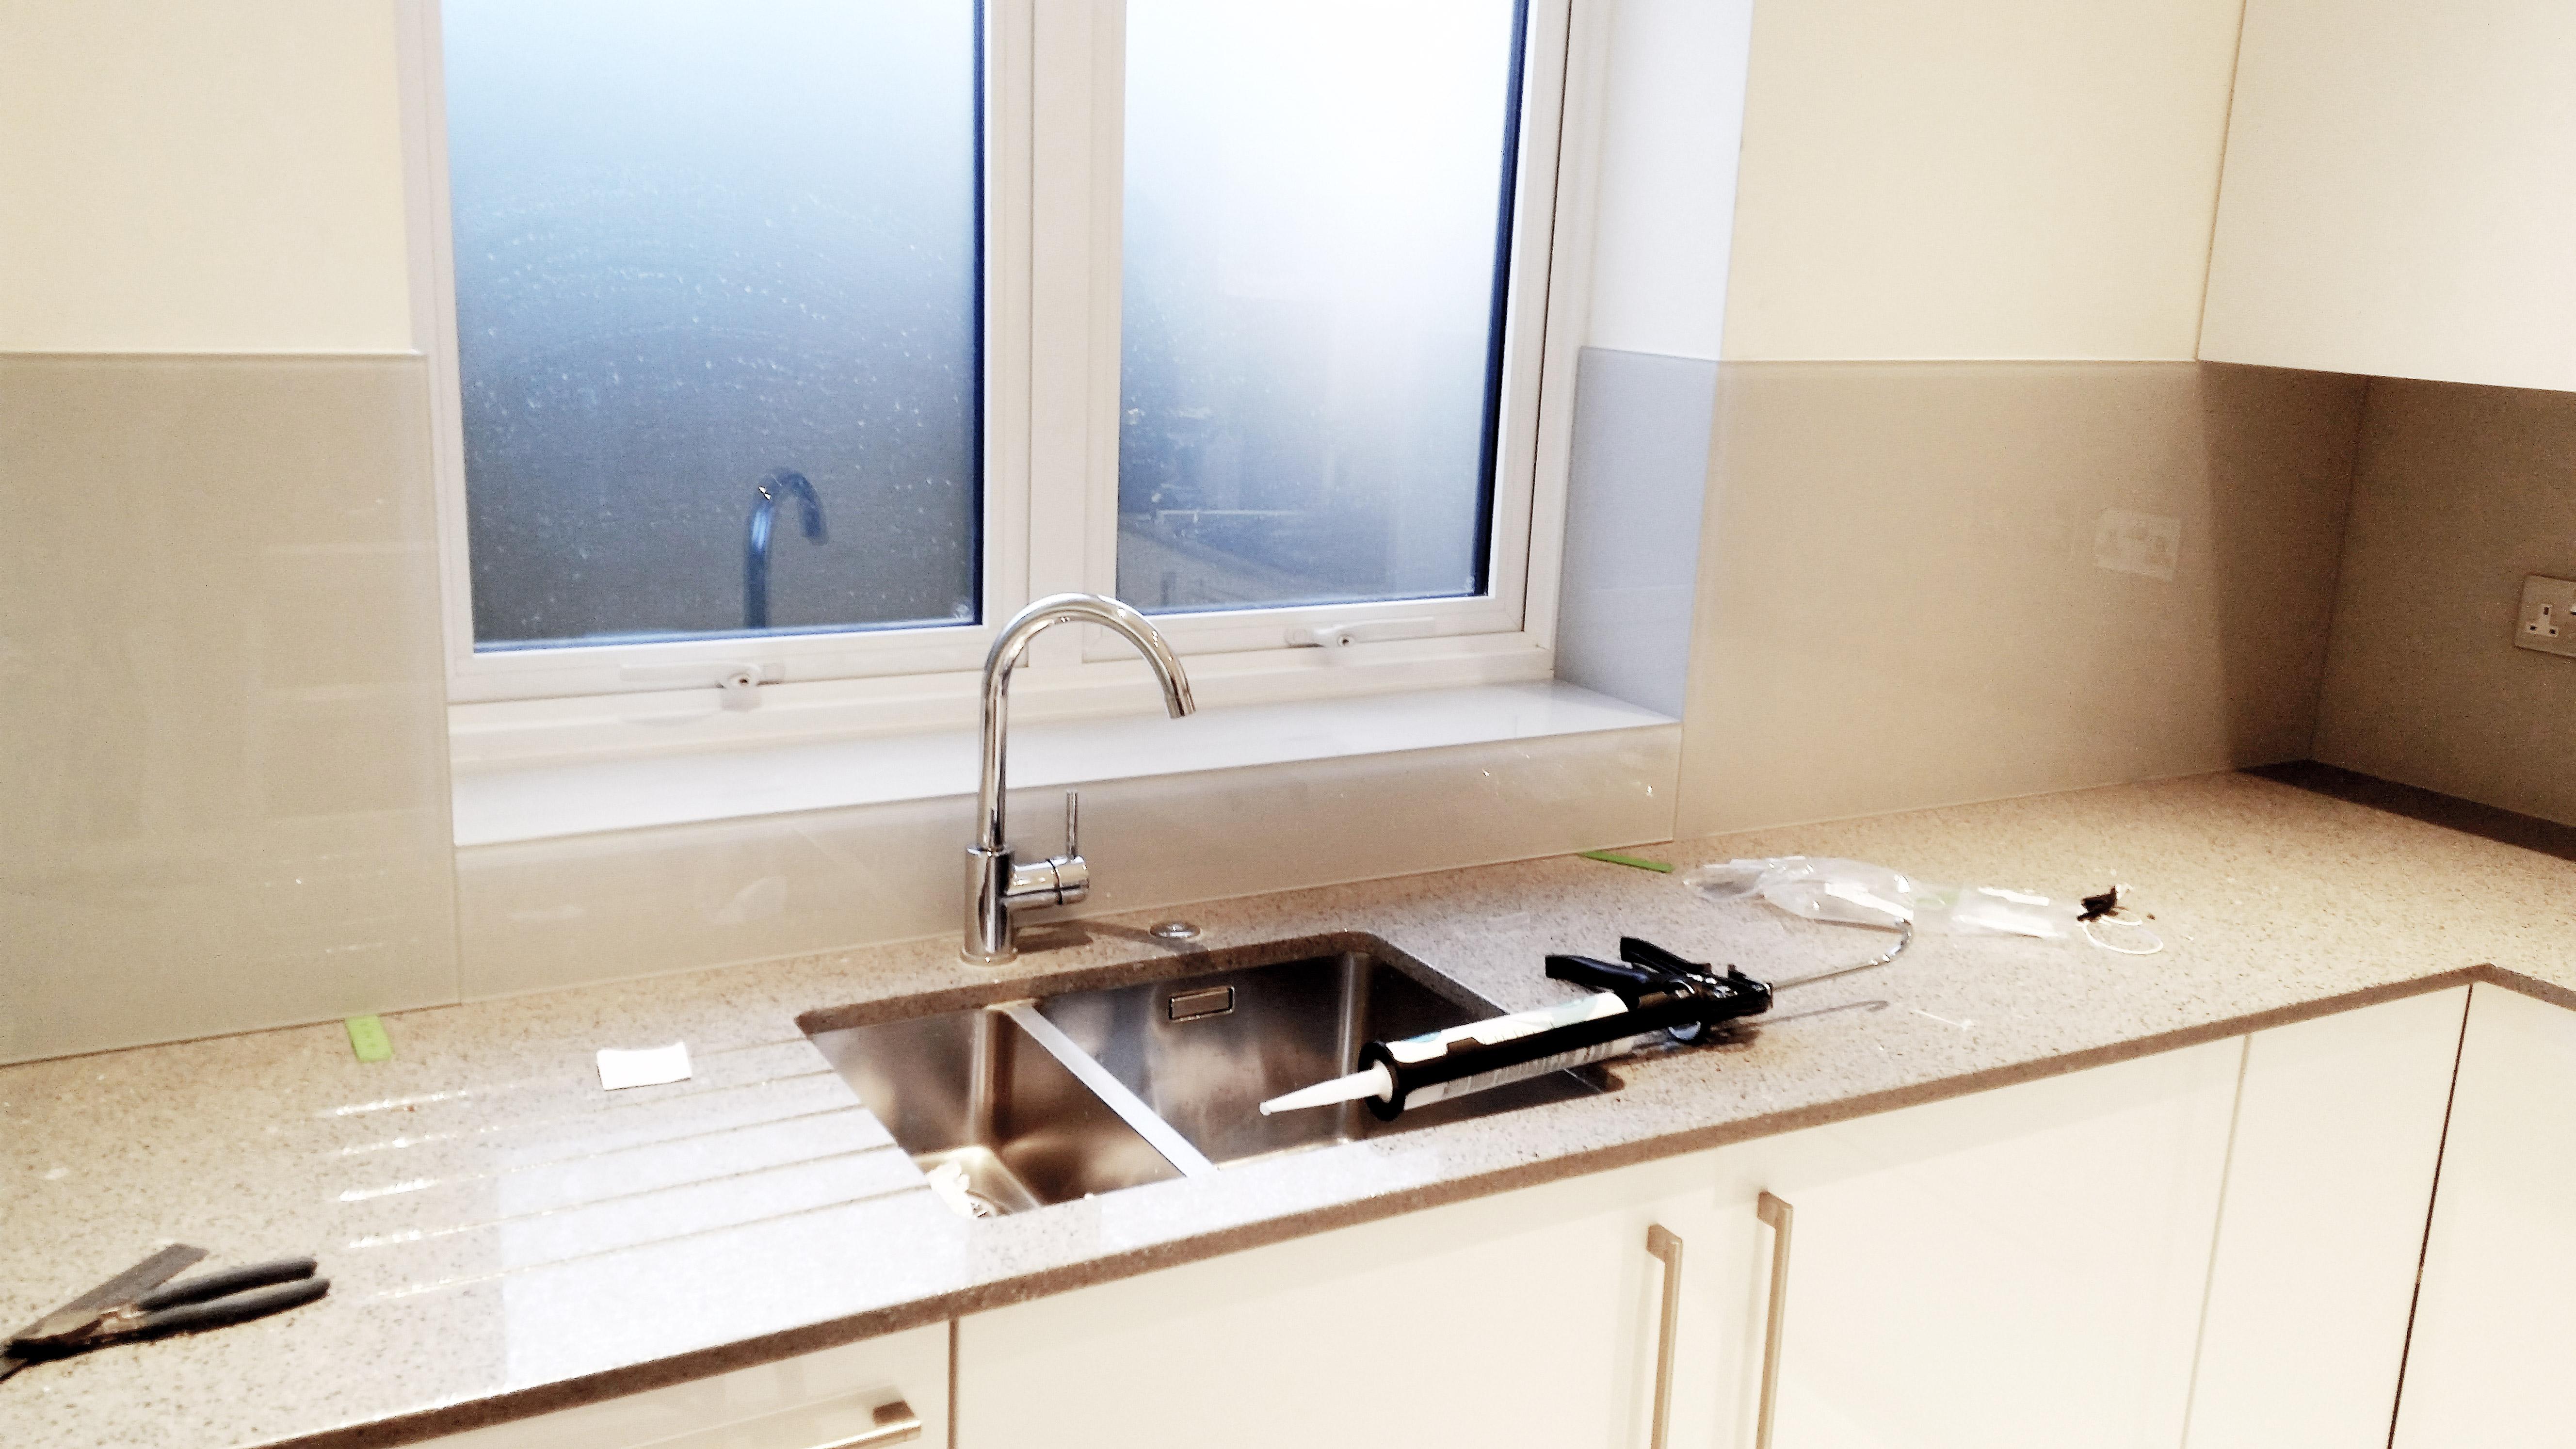 Kitchen & Bathroom Repairs